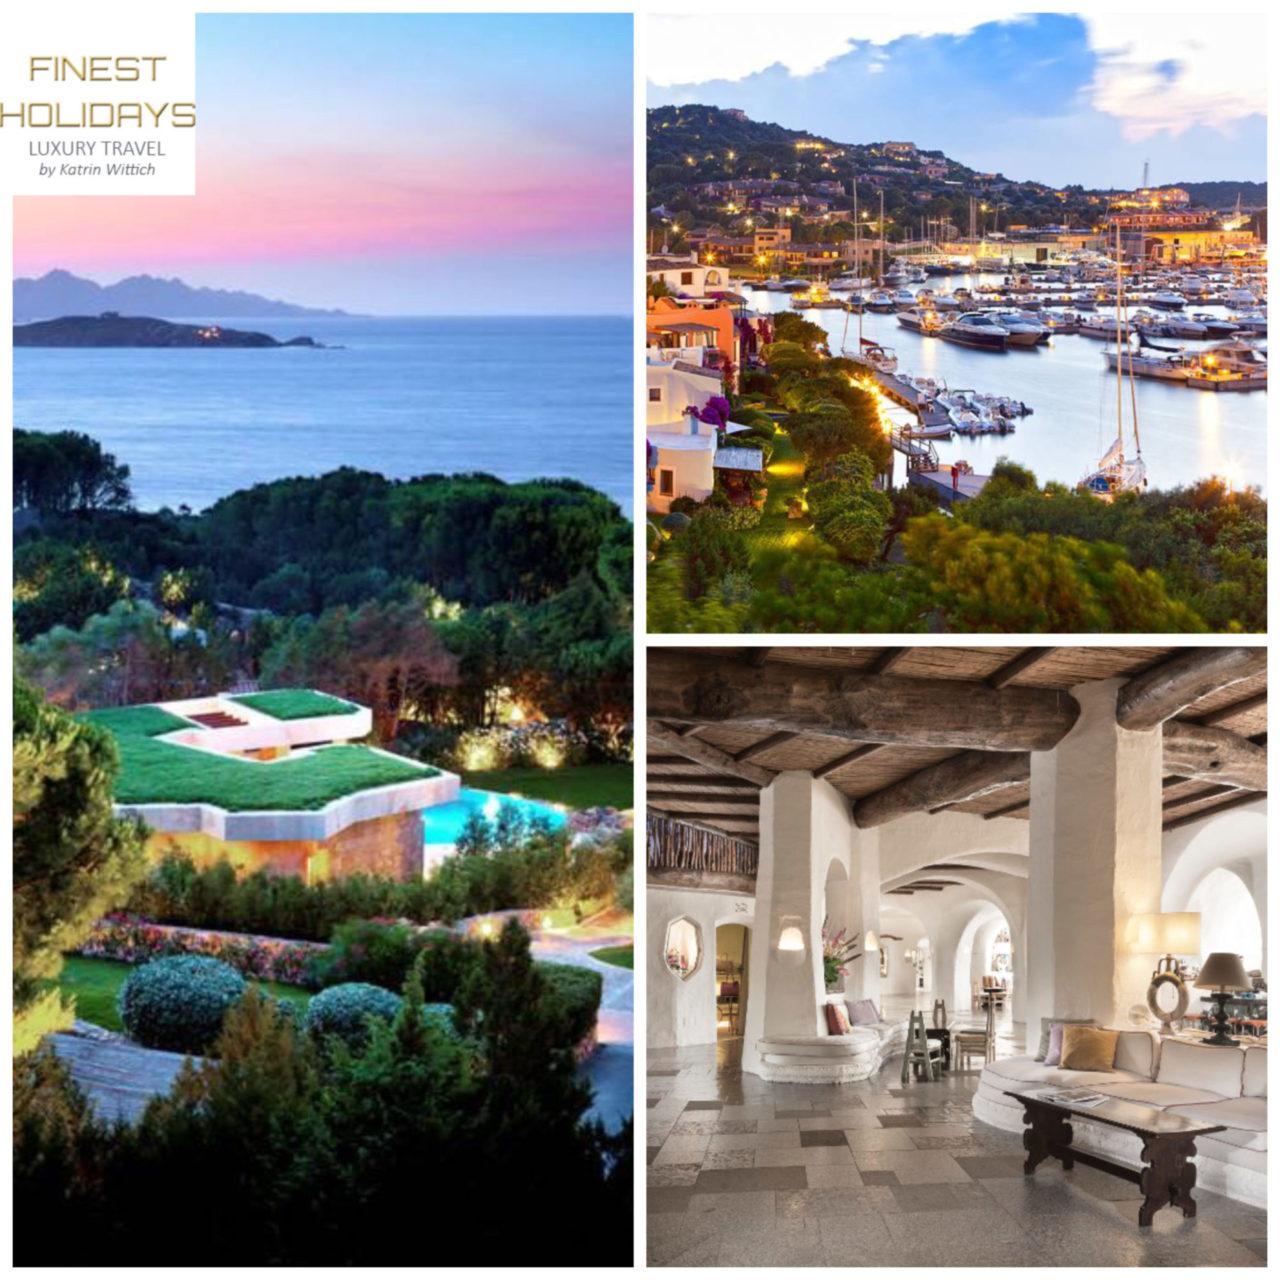 wee.finest-holidays.com Sardinia, Costa Smeralda, Poro Cervo, holiday villas, luxury hotels, Italy